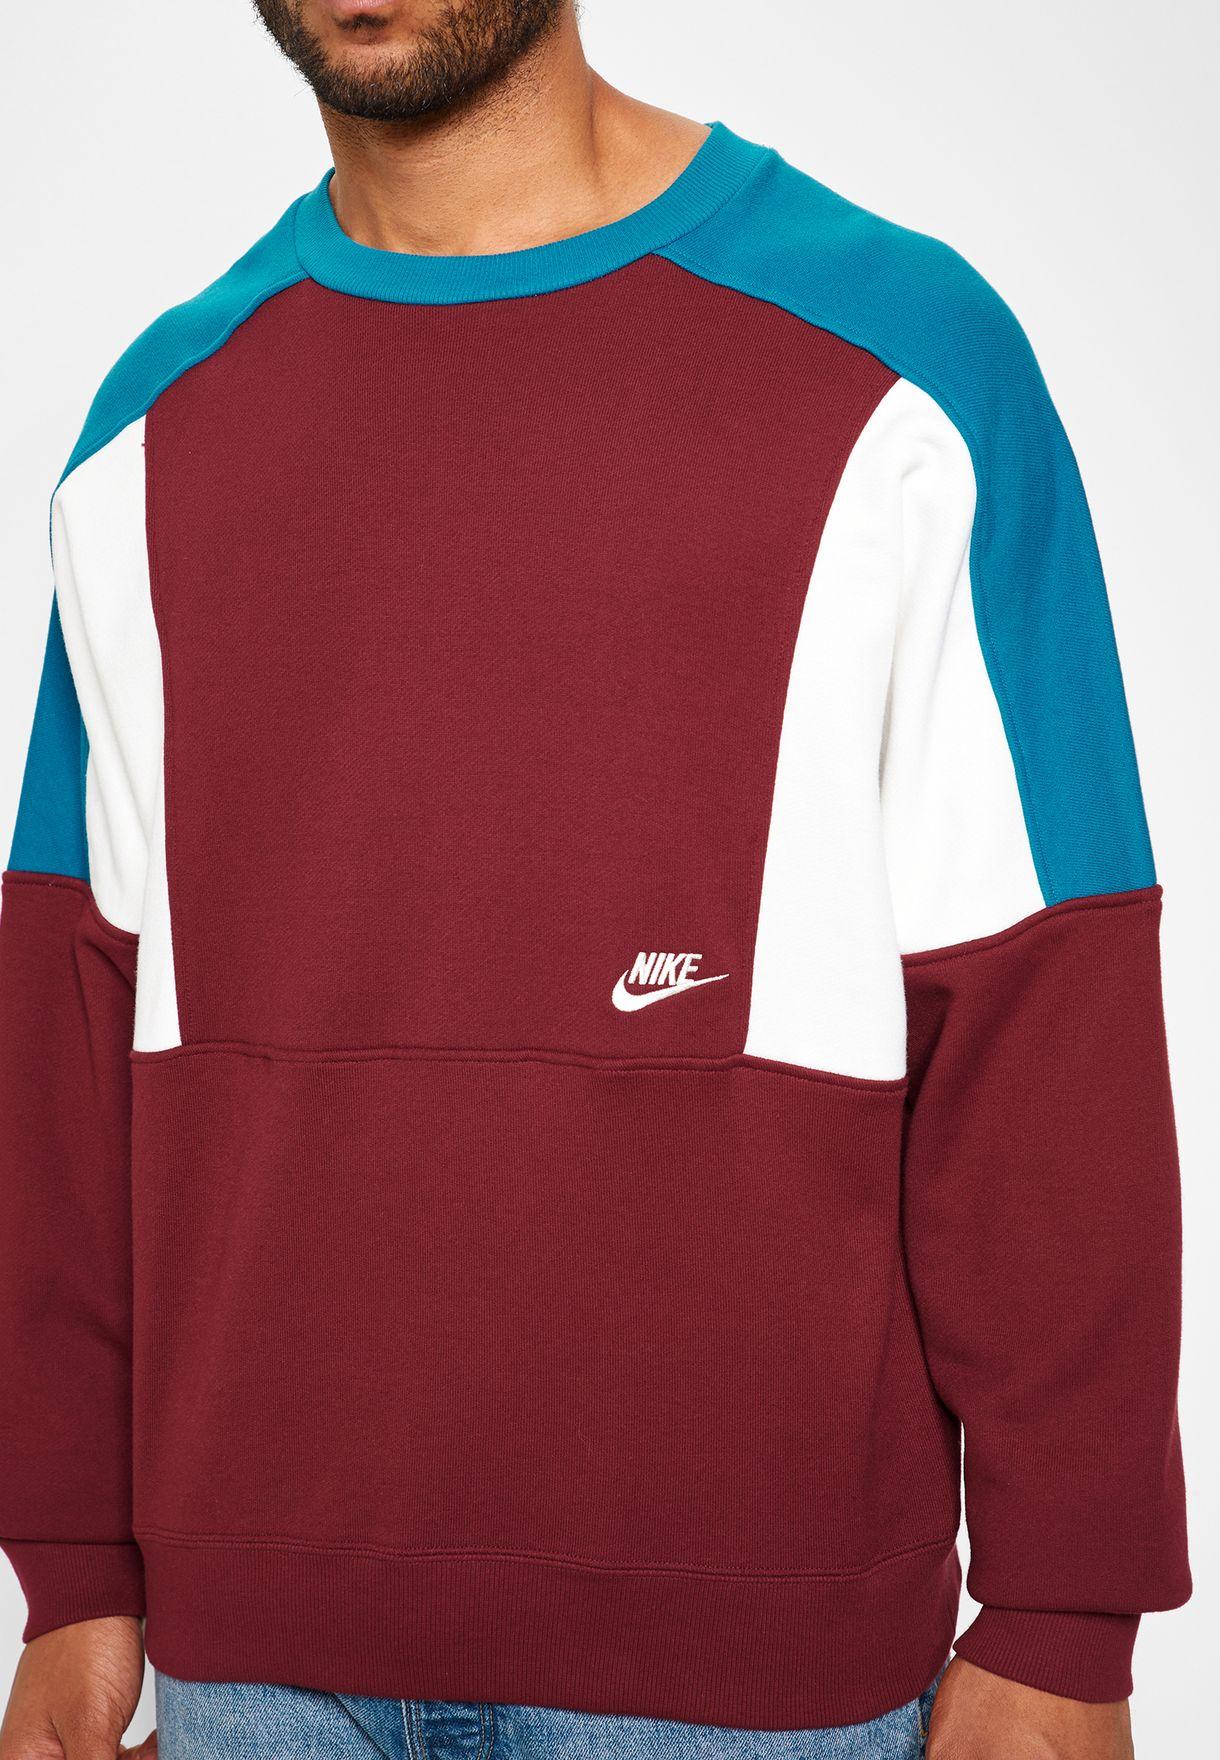 Buy Nike Burgundy Reissue Fleece Sweatshirt For Men In Mena Worldwide Aq2061 677 [ 1760 x 1220 Pixel ]